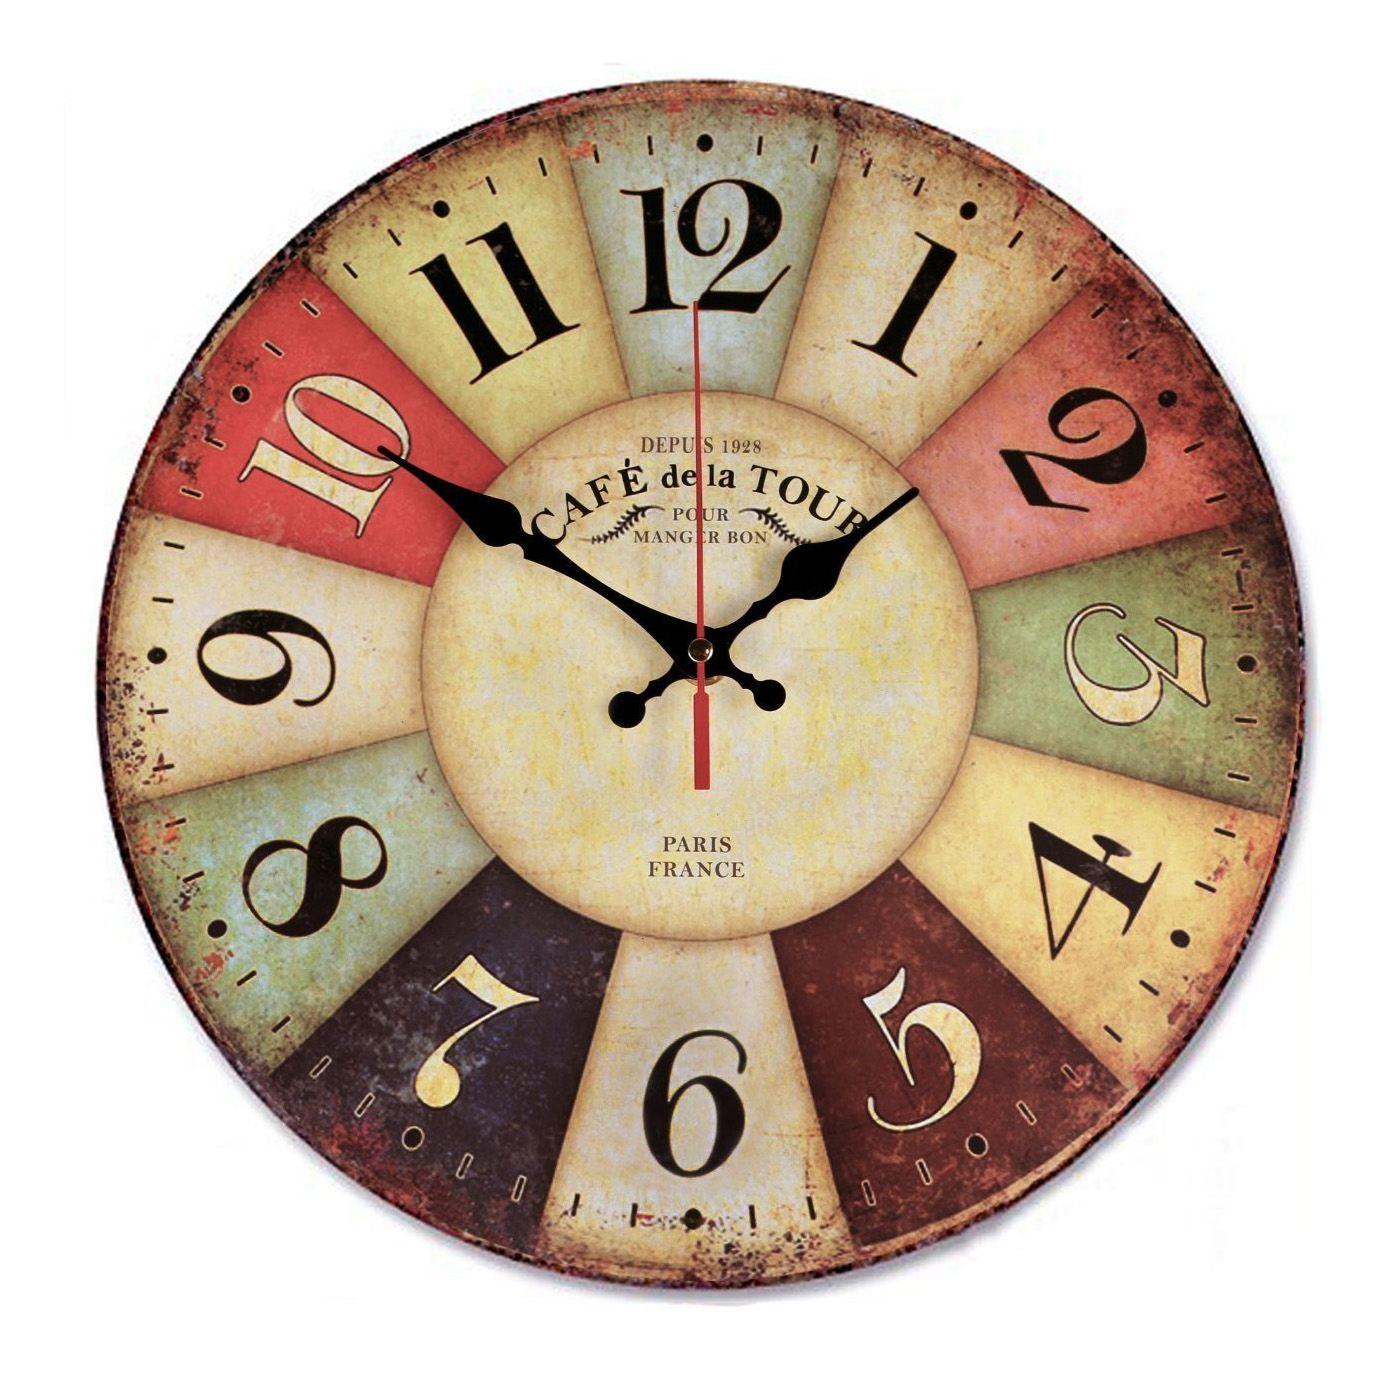 Hot Sale 12 Inch Retro Wooden Wall Clock Farmhouse Decor, Silent Non Ticking Wall Clocks Large Decorative - Big Wood Atomic An